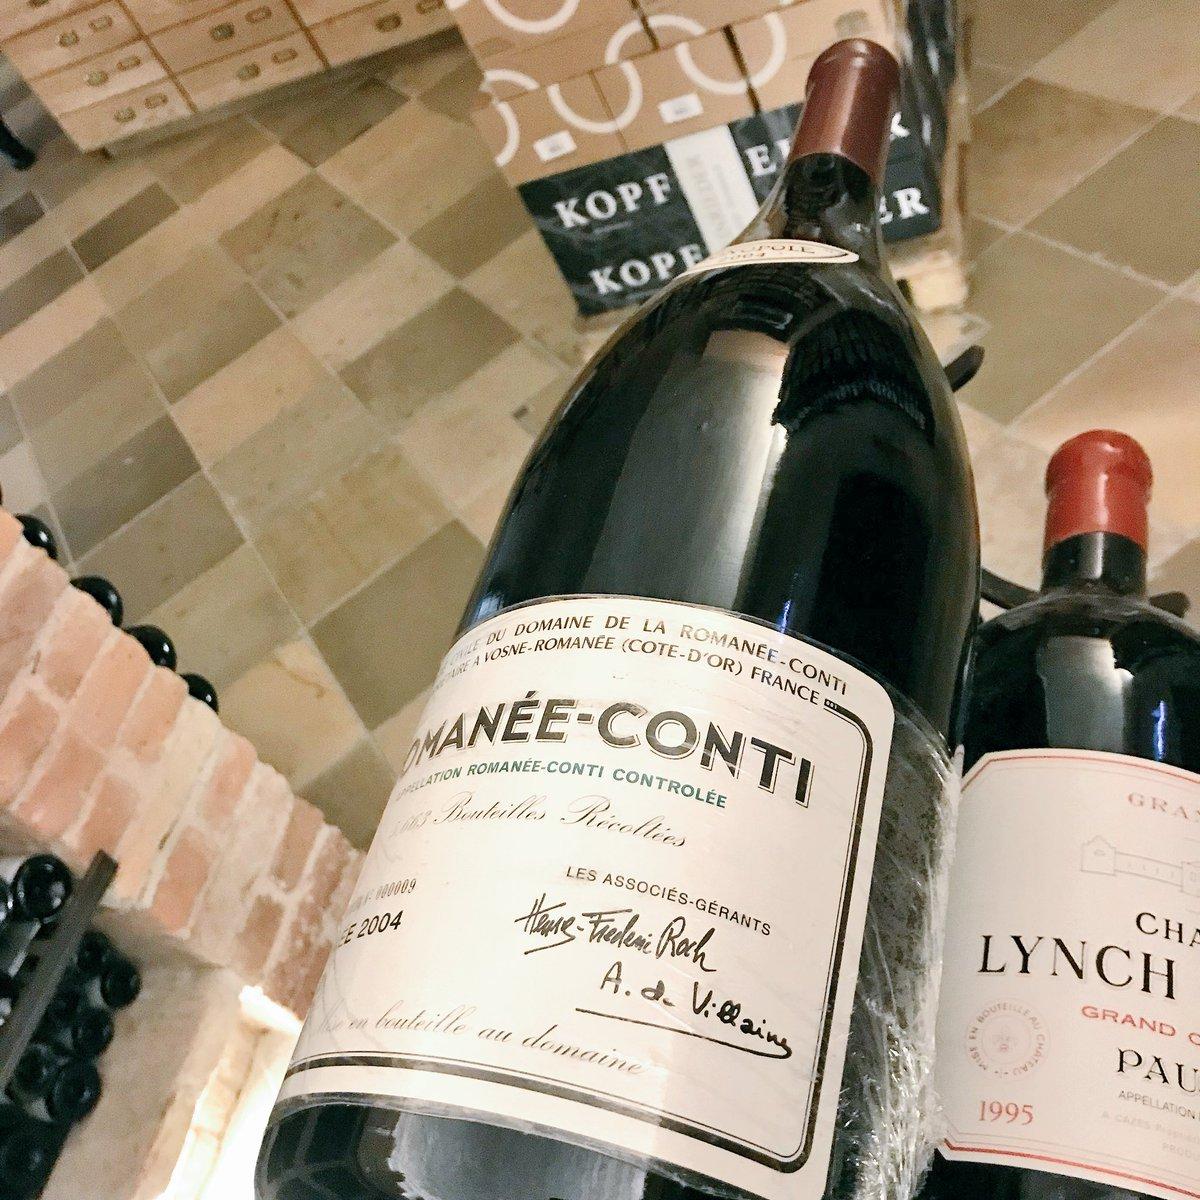 6L Btl DRC EUR125k 82 Cheval Blanc OMG 45 Victory Ch Mouton Rothschild Me Just An Pomeral Amazing JMiquelWine Winewankers MacCocktail